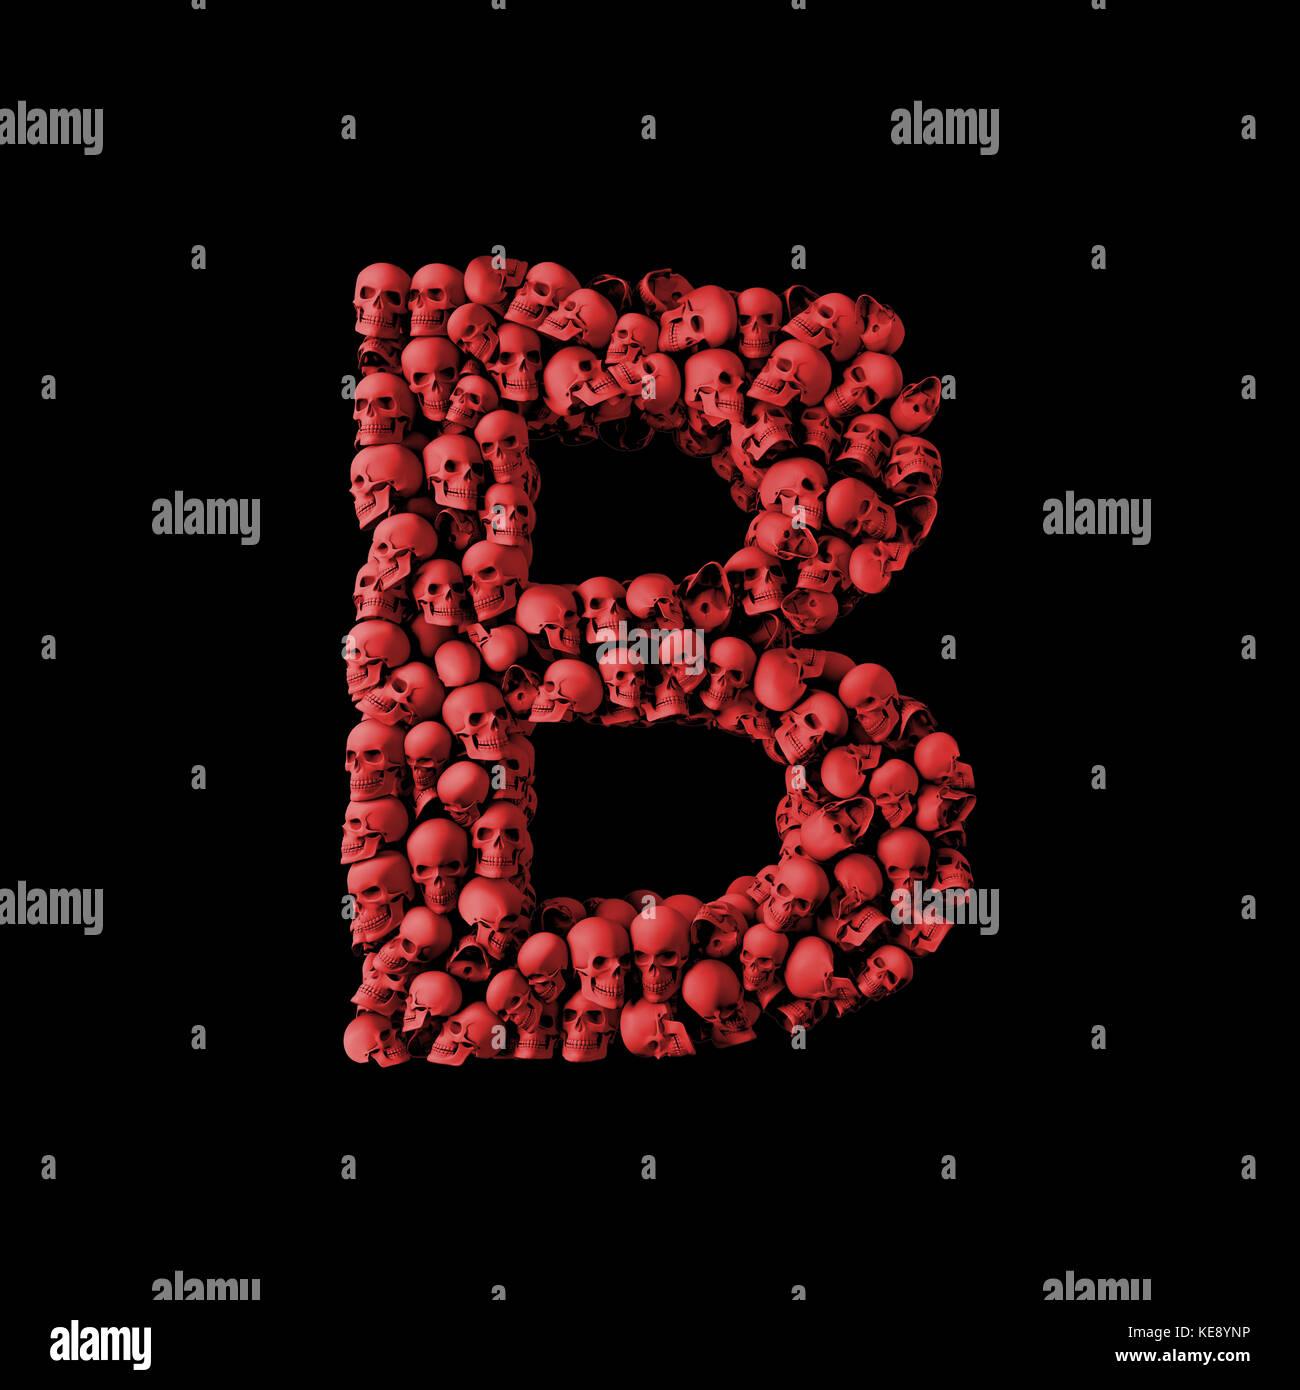 a8356b4c5 ... Letter B Red Skull Font Type Made From Skulls 3D Rendering Stock ·  Logotipo Da Letra B Ilustração Do Vetor Ilustração De Tipo 22214520 ...